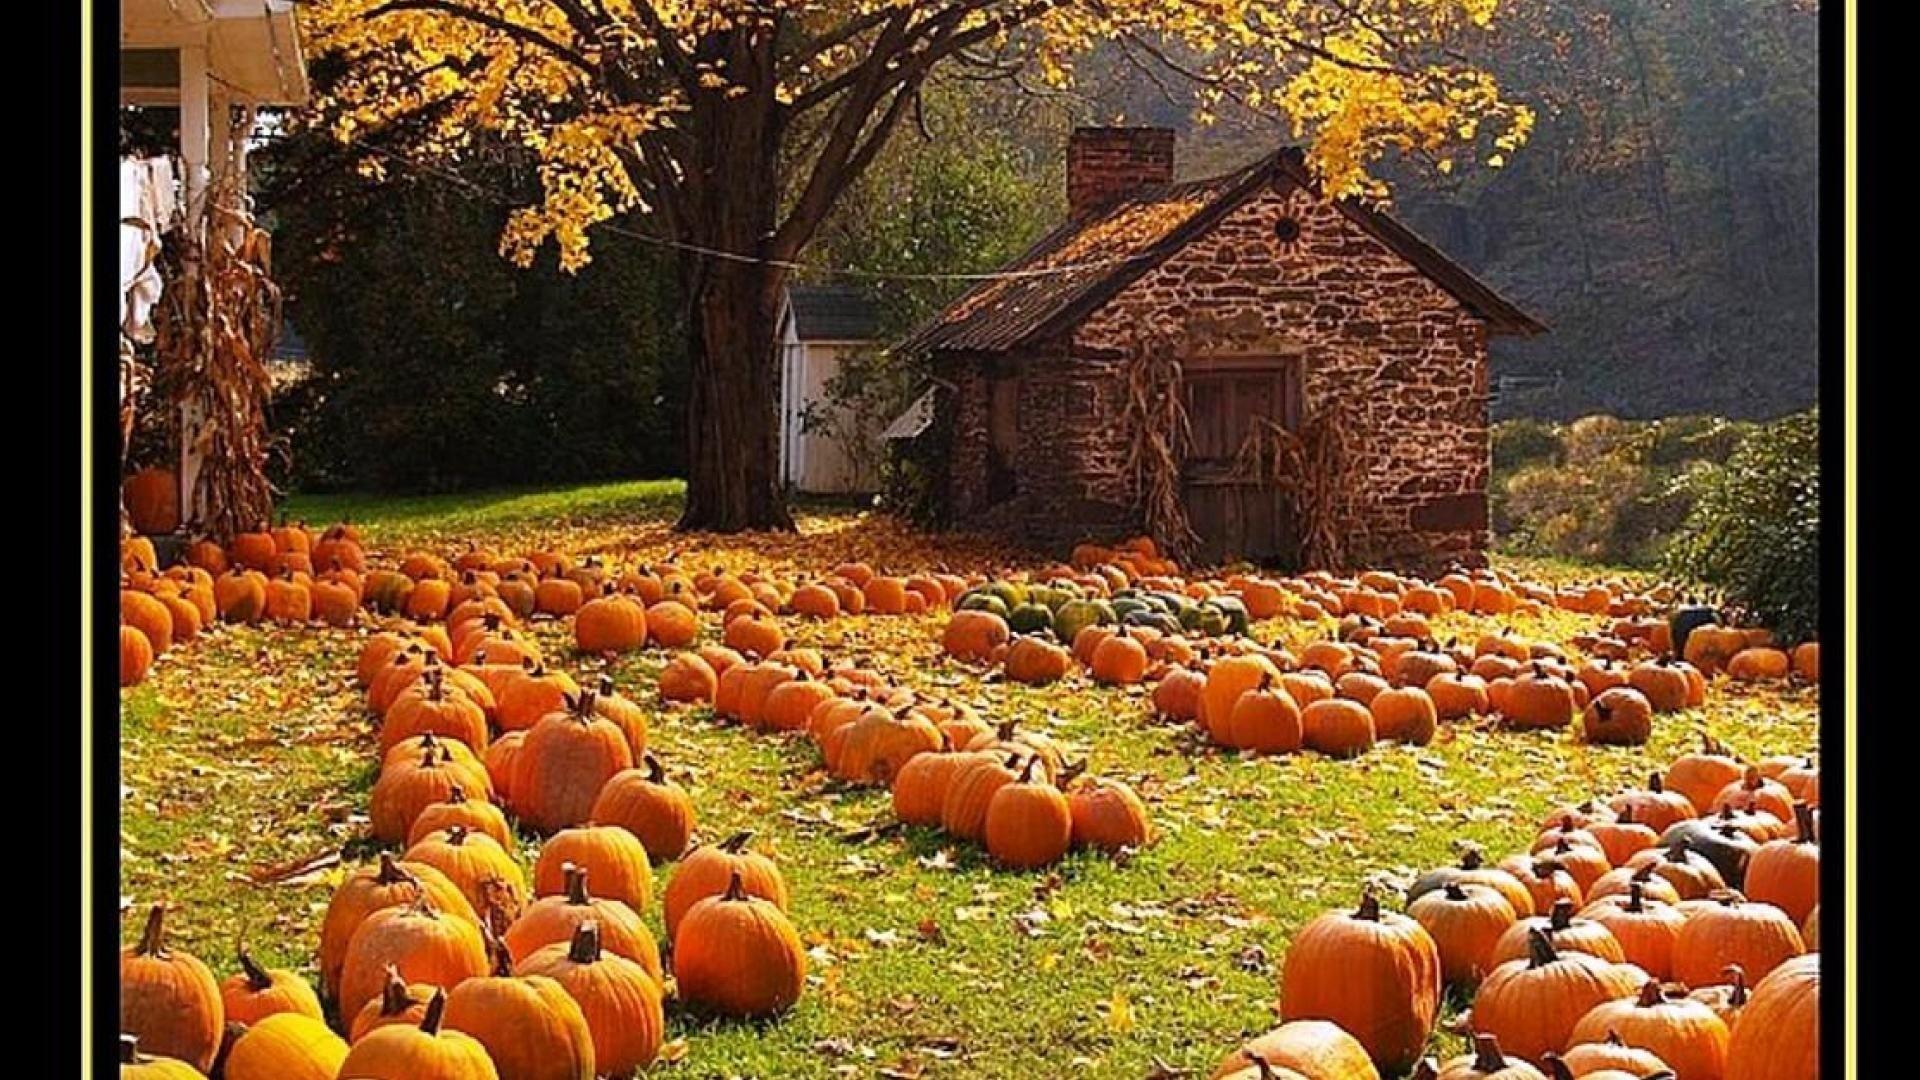 Hd Wallpaper Texture Fall Harvest Fall Harvest Wallpaper 54 Images